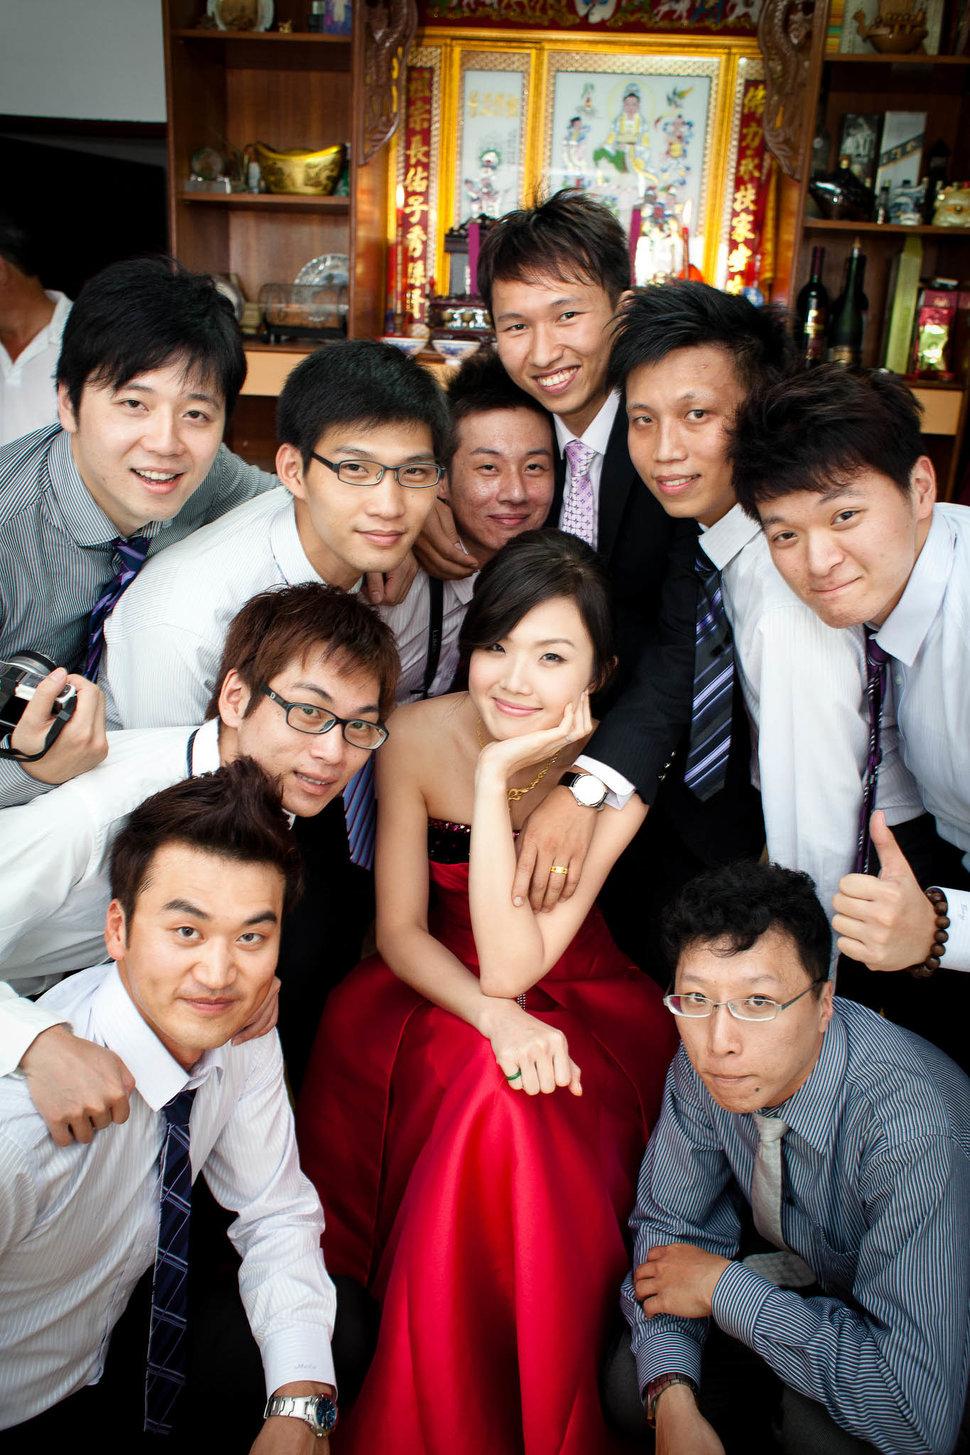 18PHOTO-敔帆❤️ 卿瑜(編號:242275) - 18PHOTO 婚紗影像攝影工作室 - 結婚吧